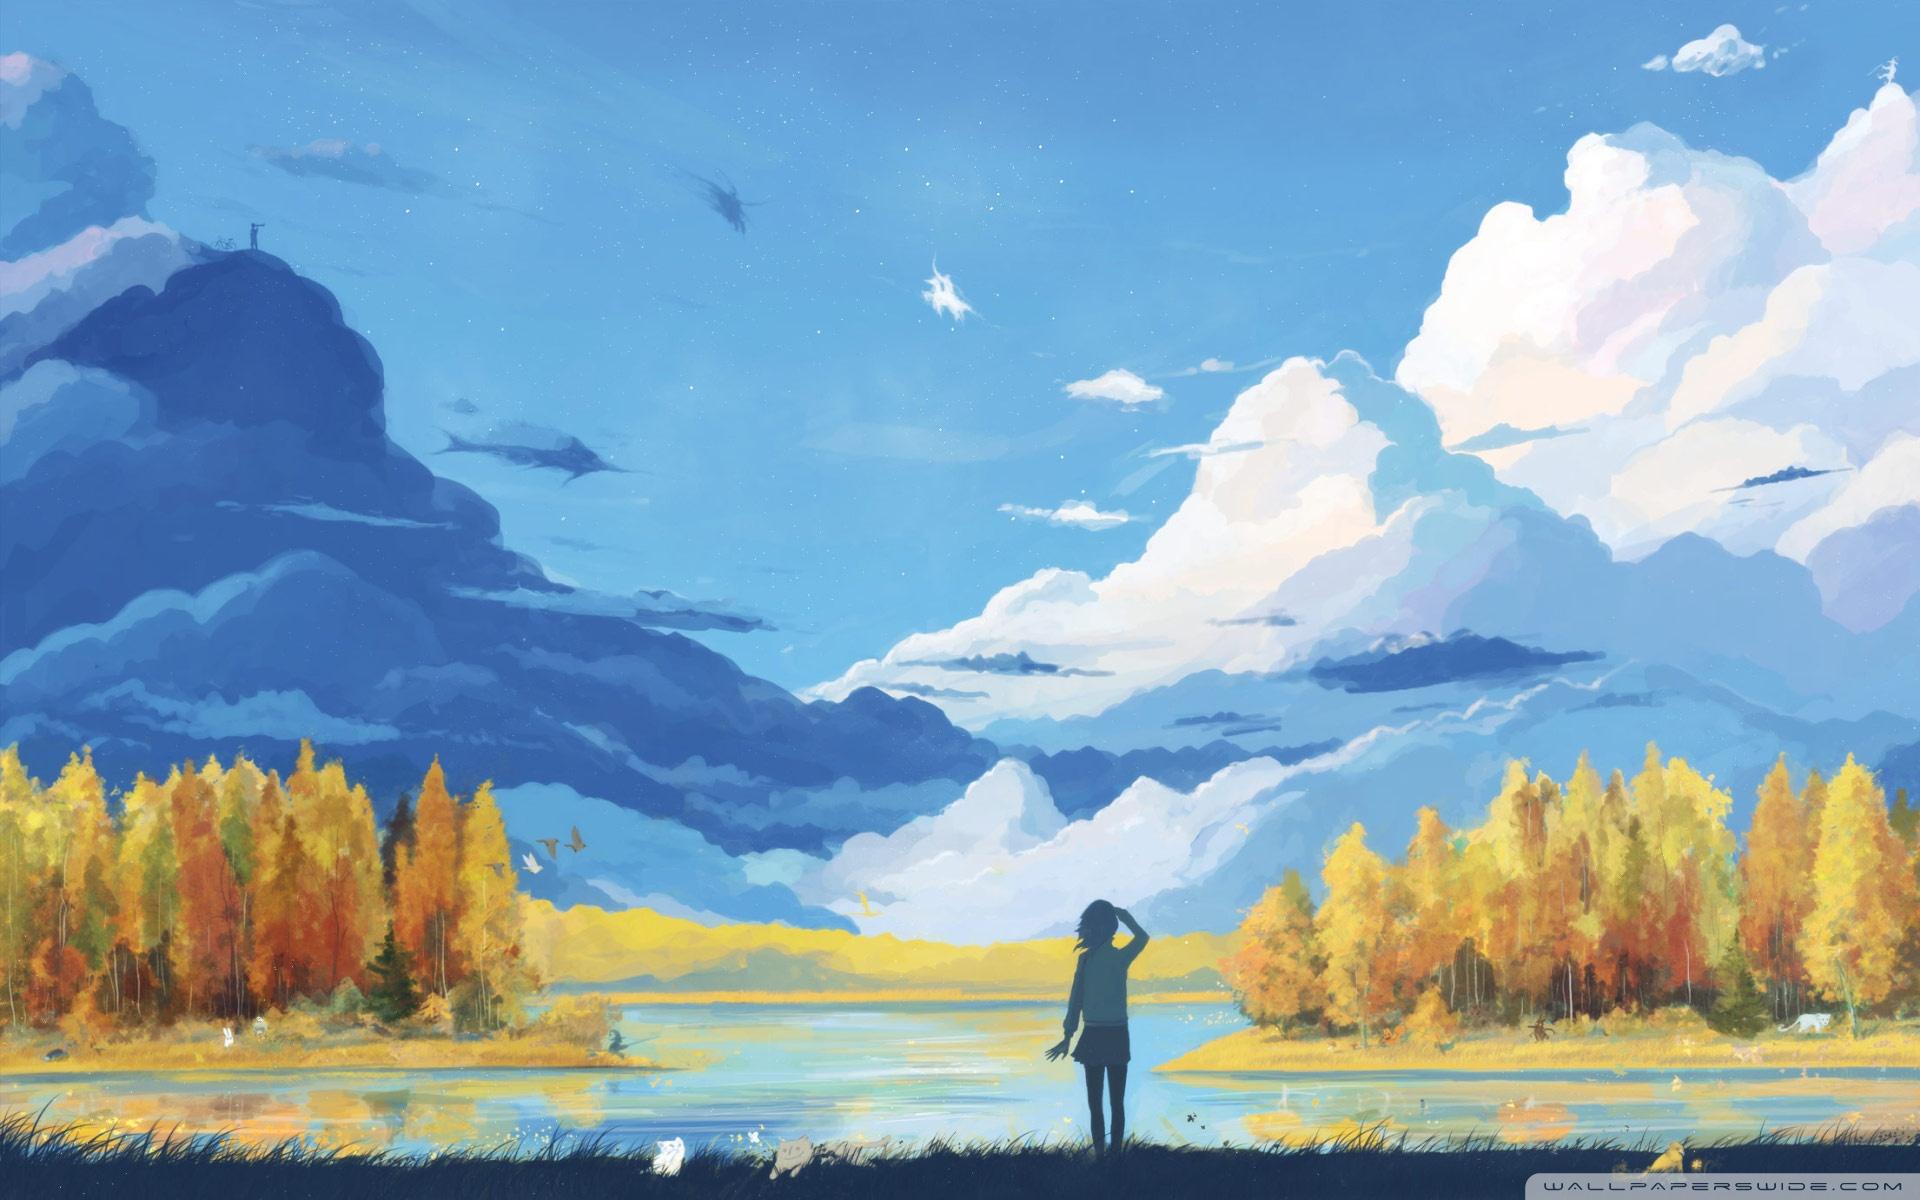 Drawn wallpaper scenery HD Painting Fall : wallpaper